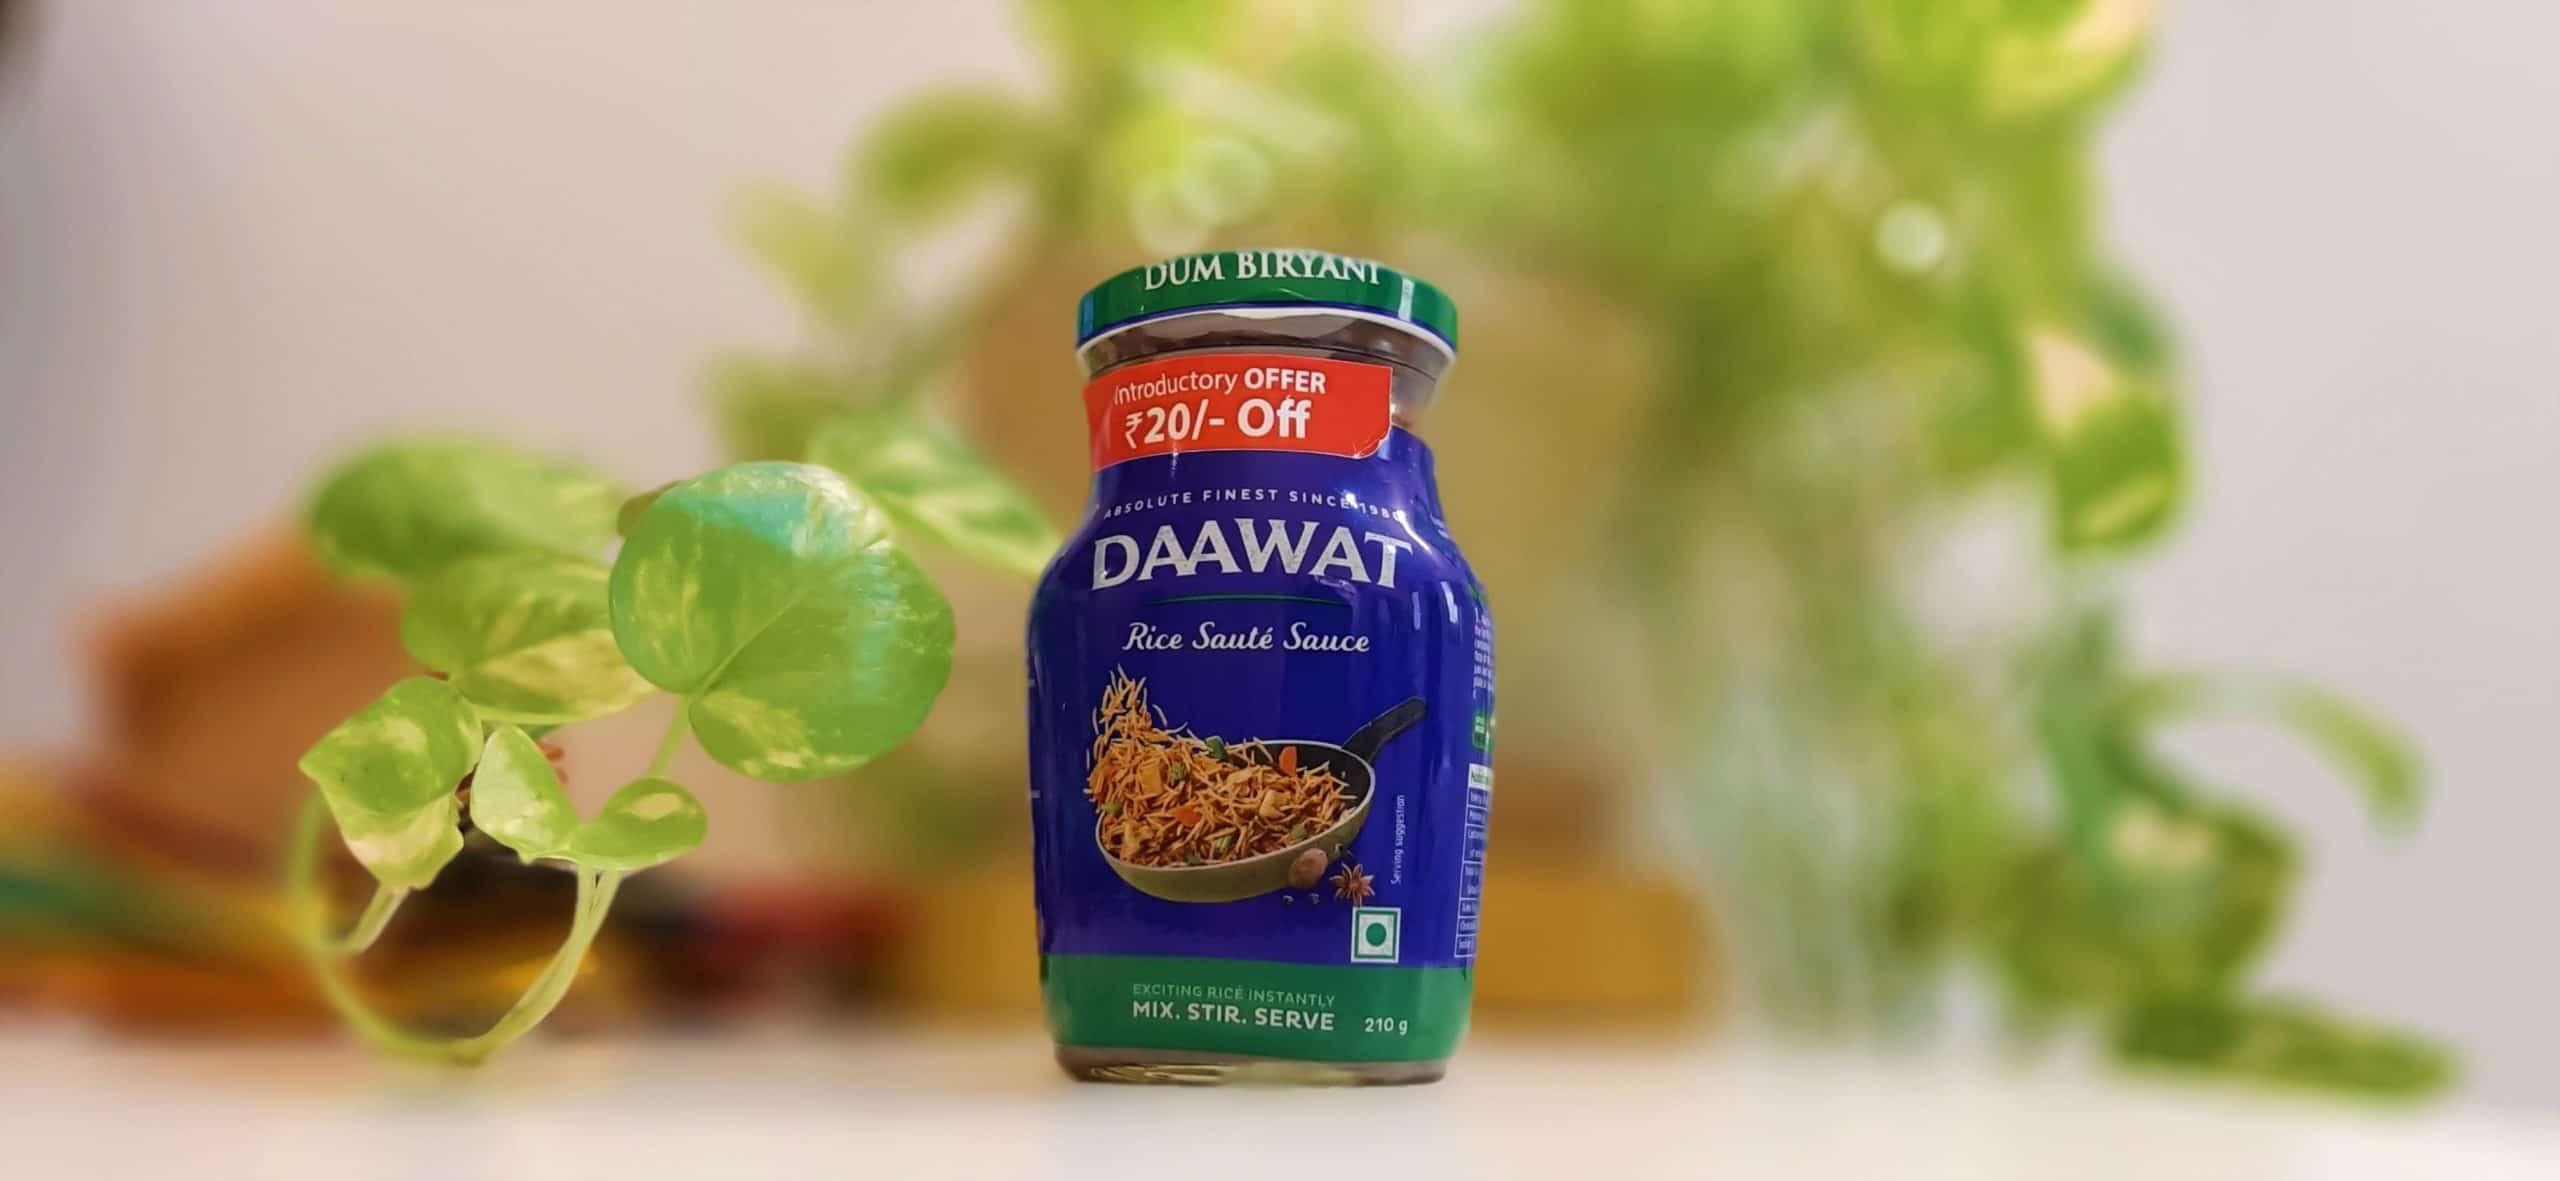 Daawat's Rice Sauté Sauce (Dum Biryani)-mishry